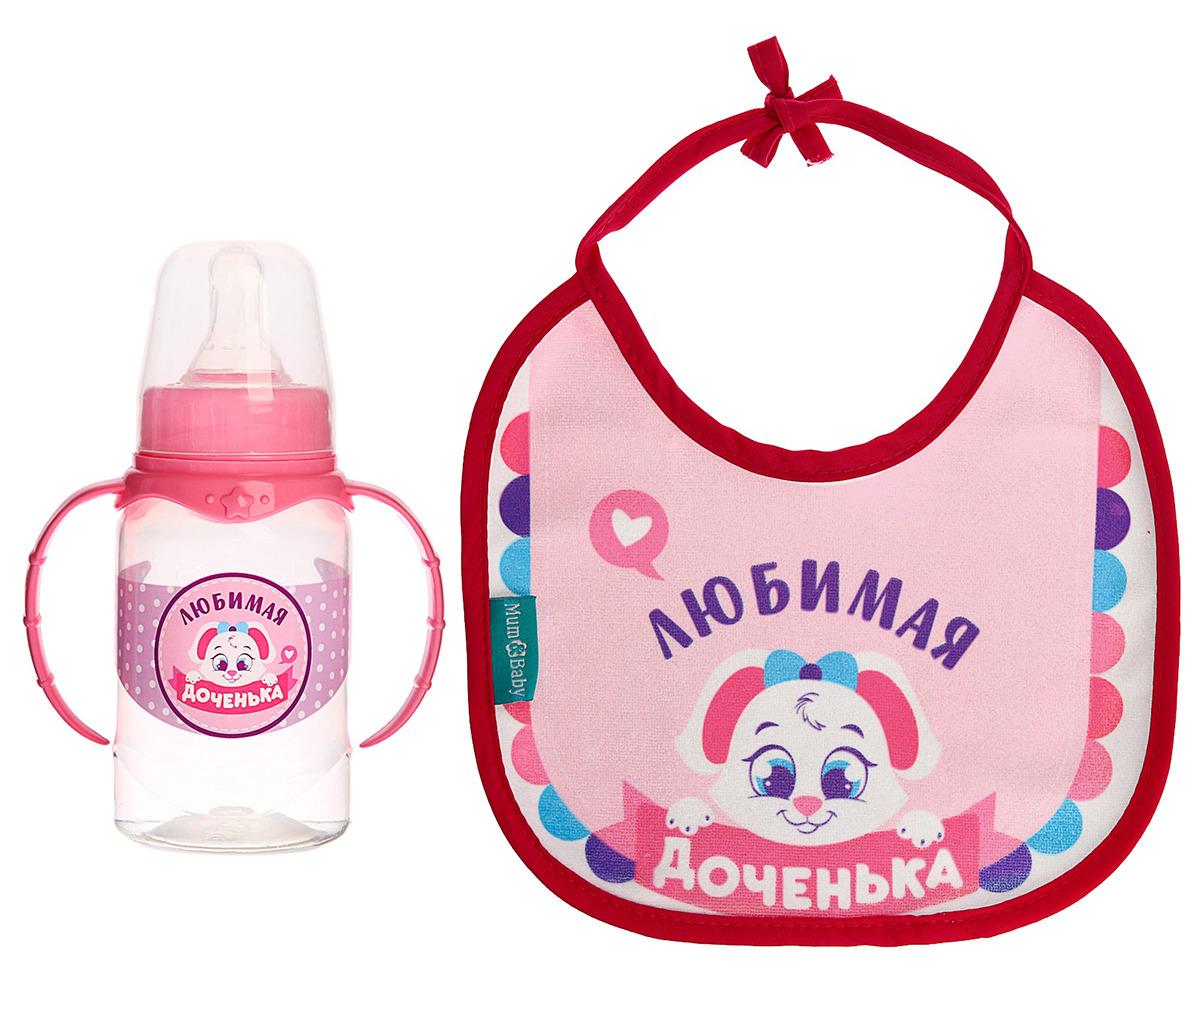 Набор Mum&Baby Доченька,3654355, бутылочка для кормления, 150 мл + нагрудник набор для кормления детей happy baby anti colic baby bottle 10009 lime